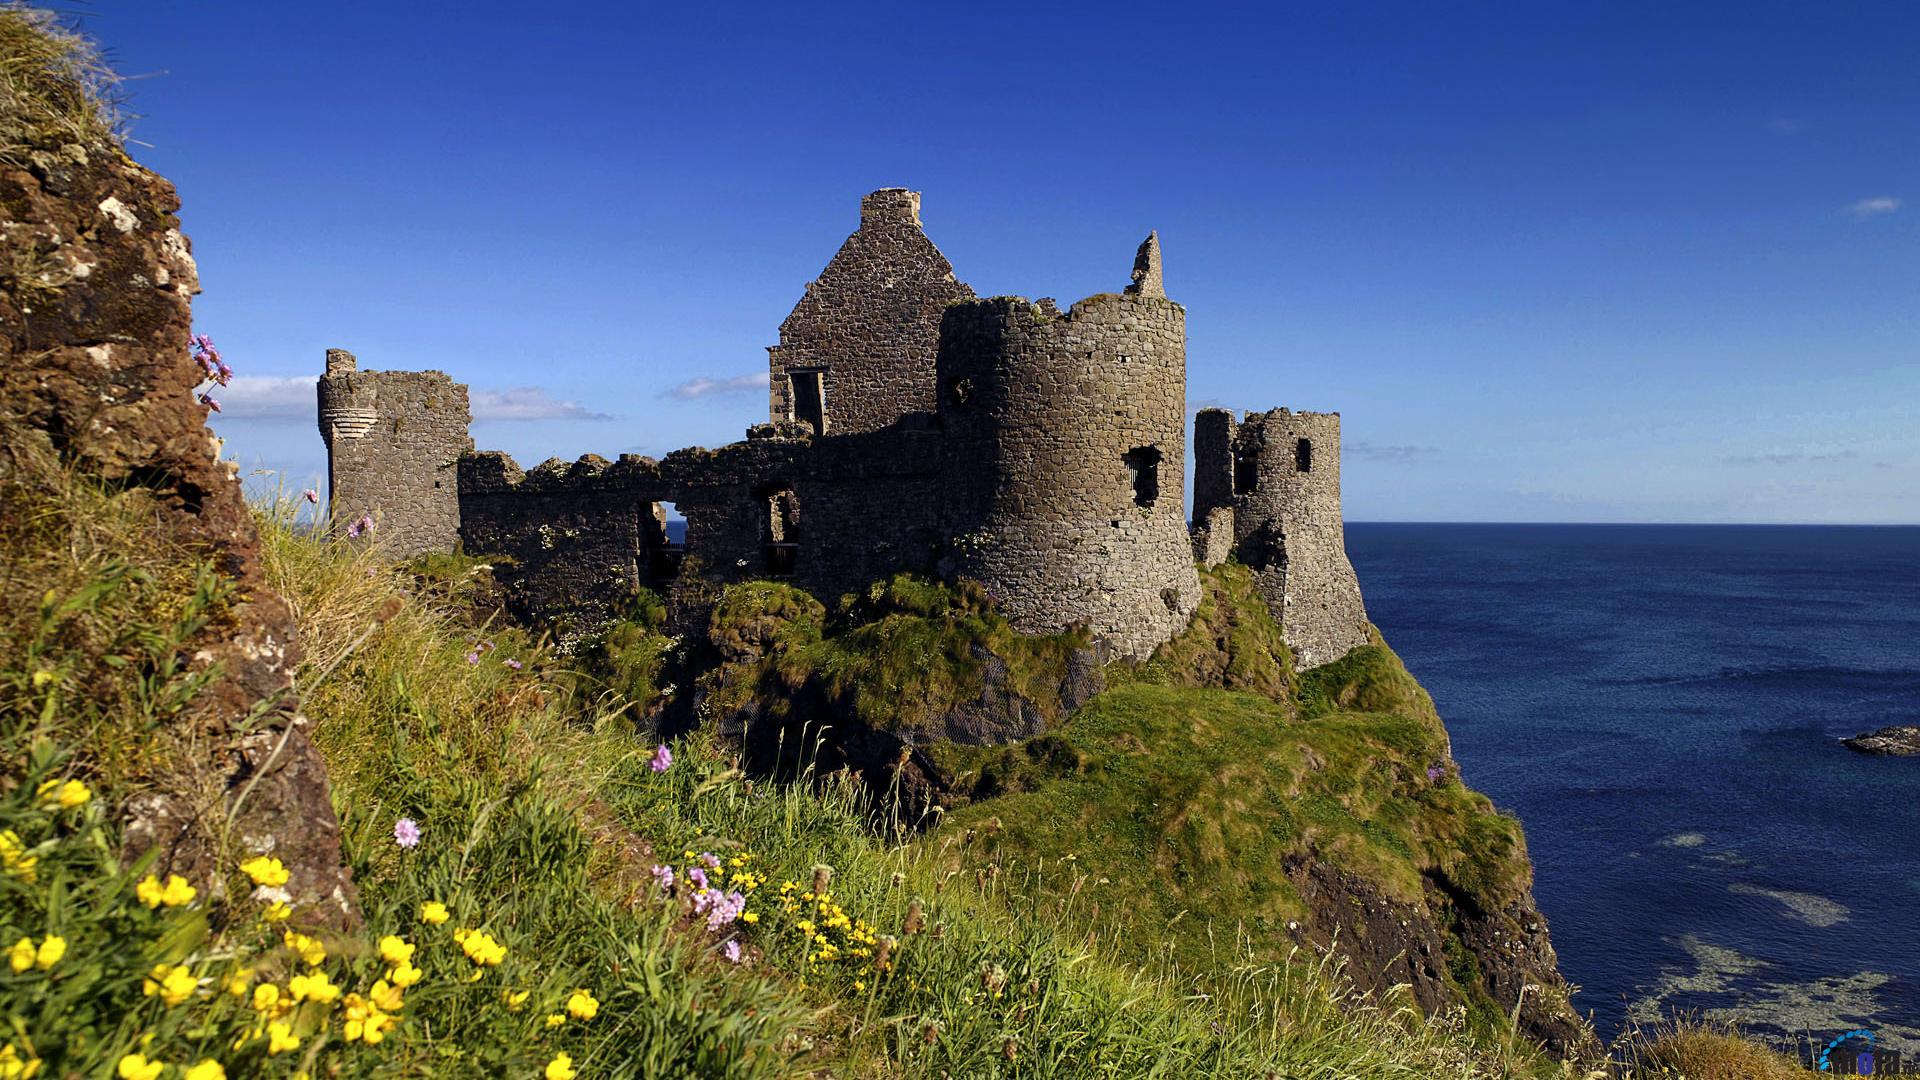 Download Wallpaper Dunluce Castle Ireland 1920 x 1080 1920x1080